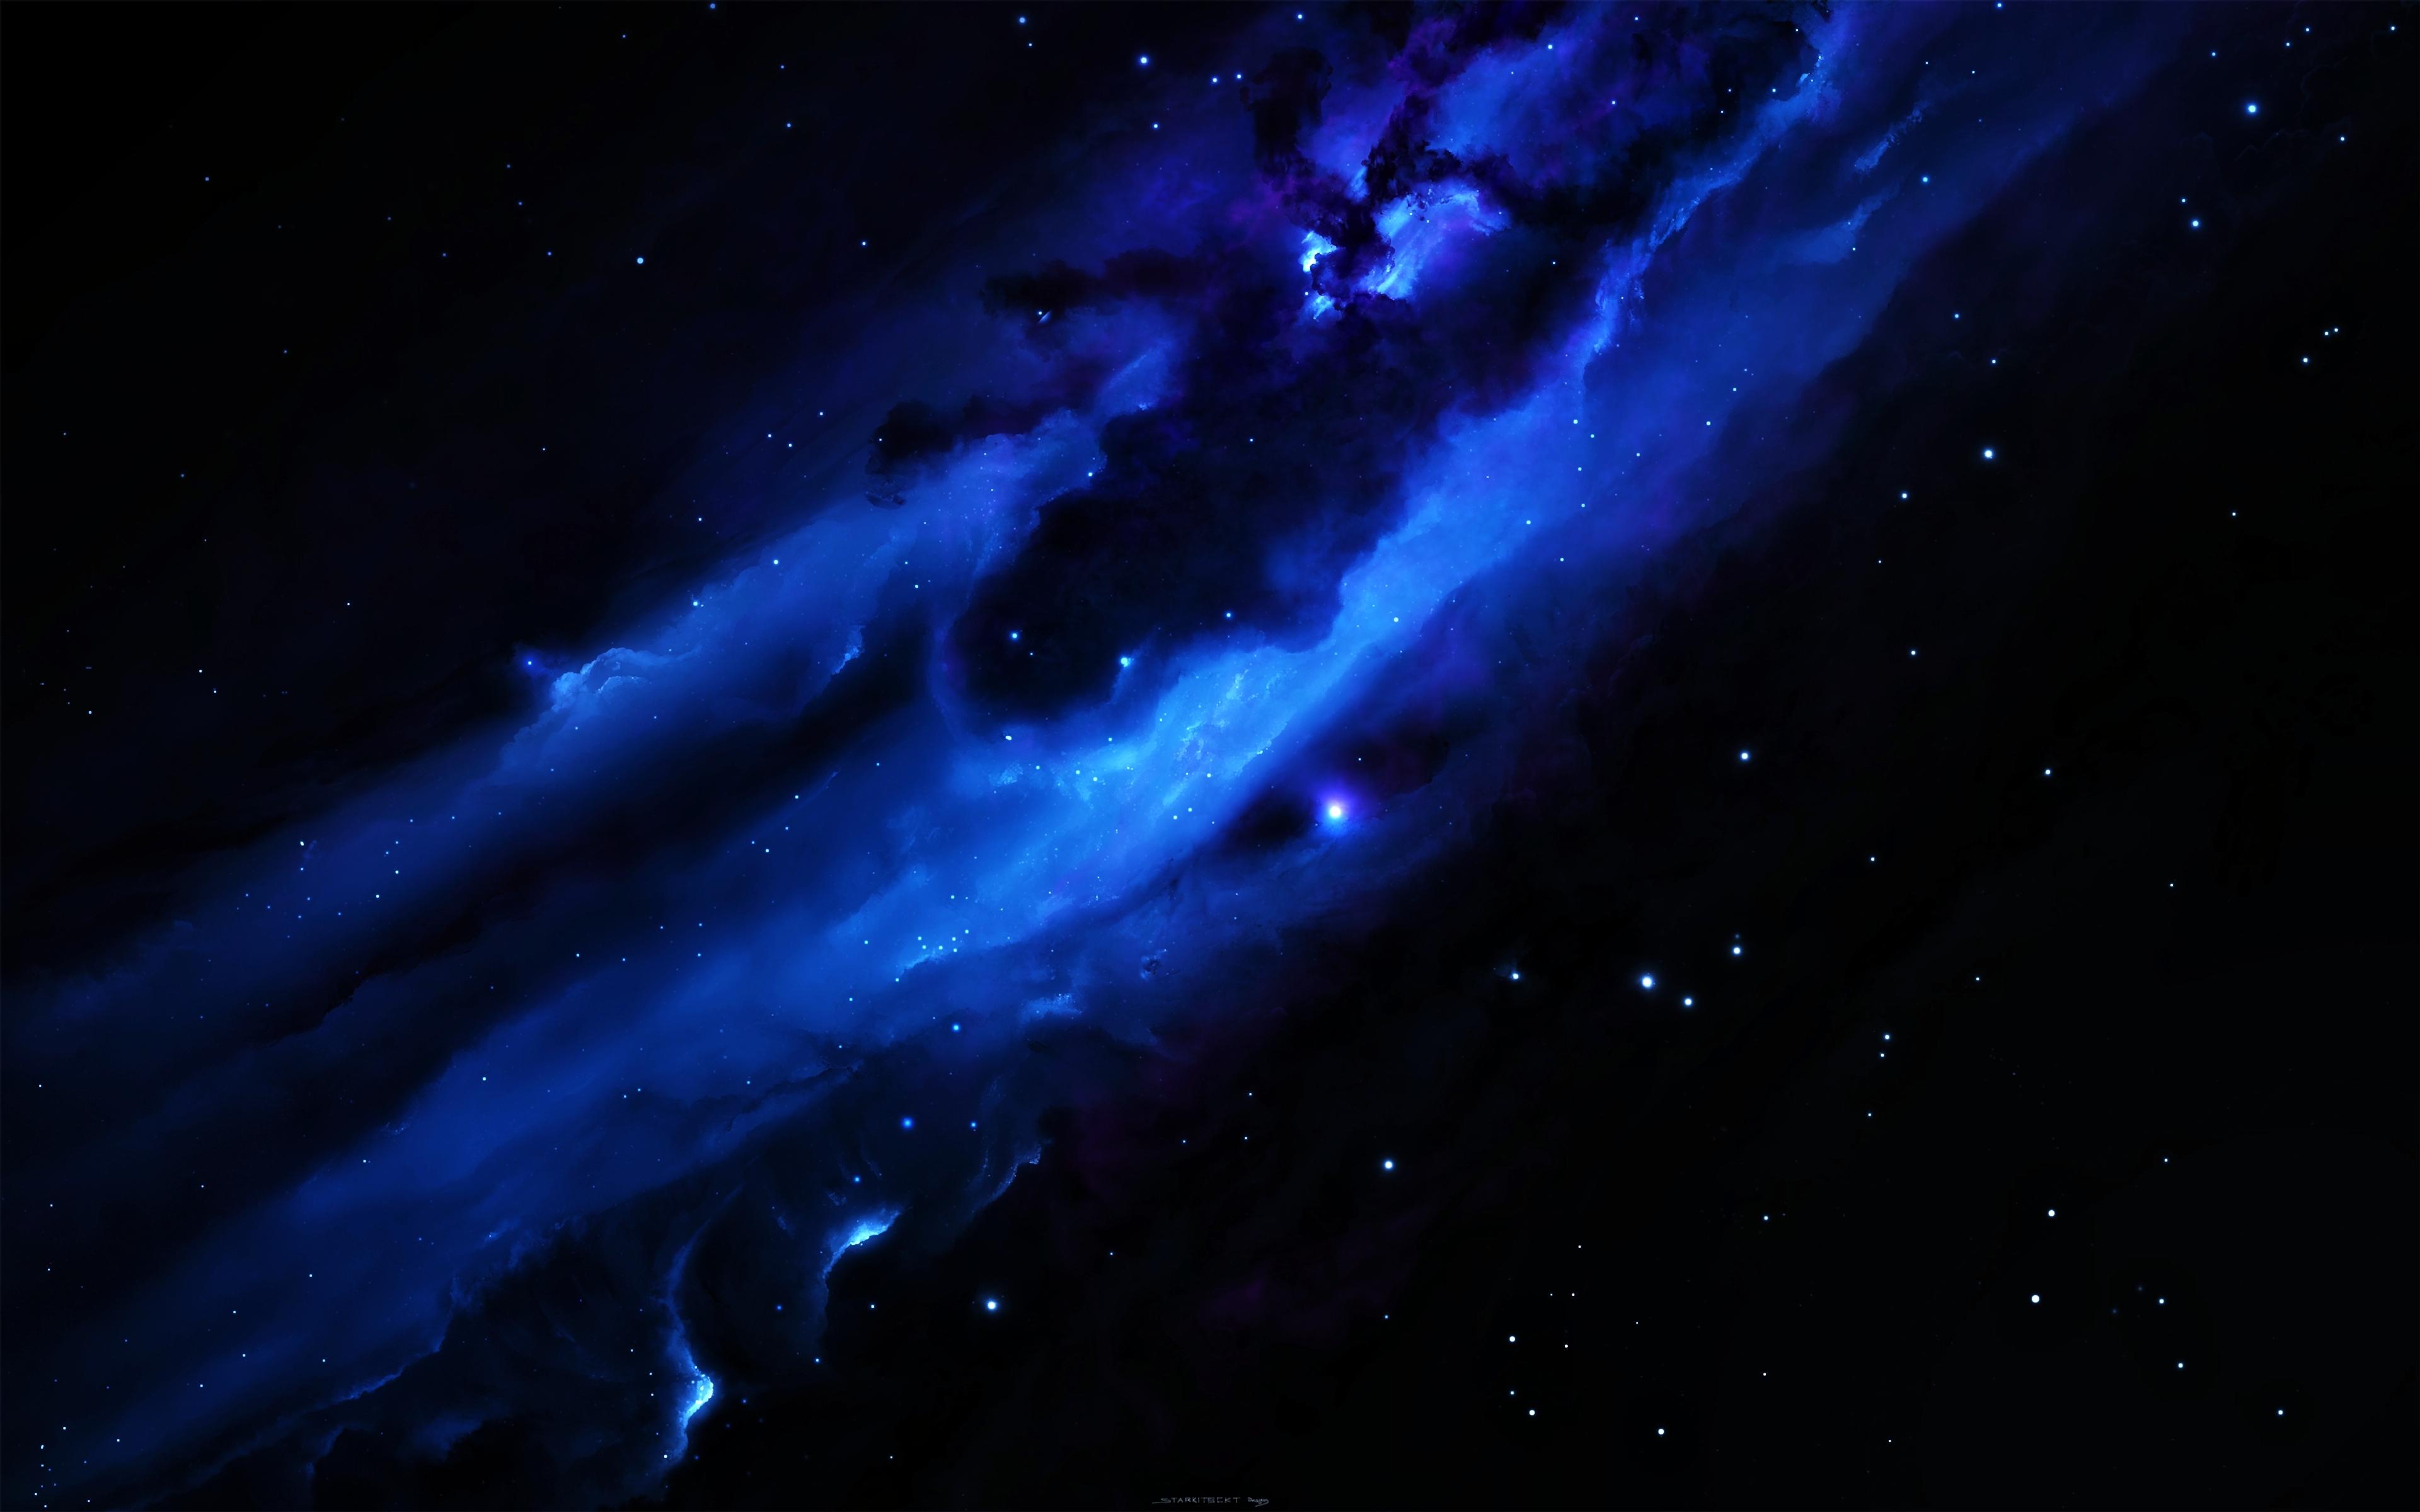 Blue galaxy 4k ultra hd fond d 39 cran and arri re plan for Fond ecran photo 4k